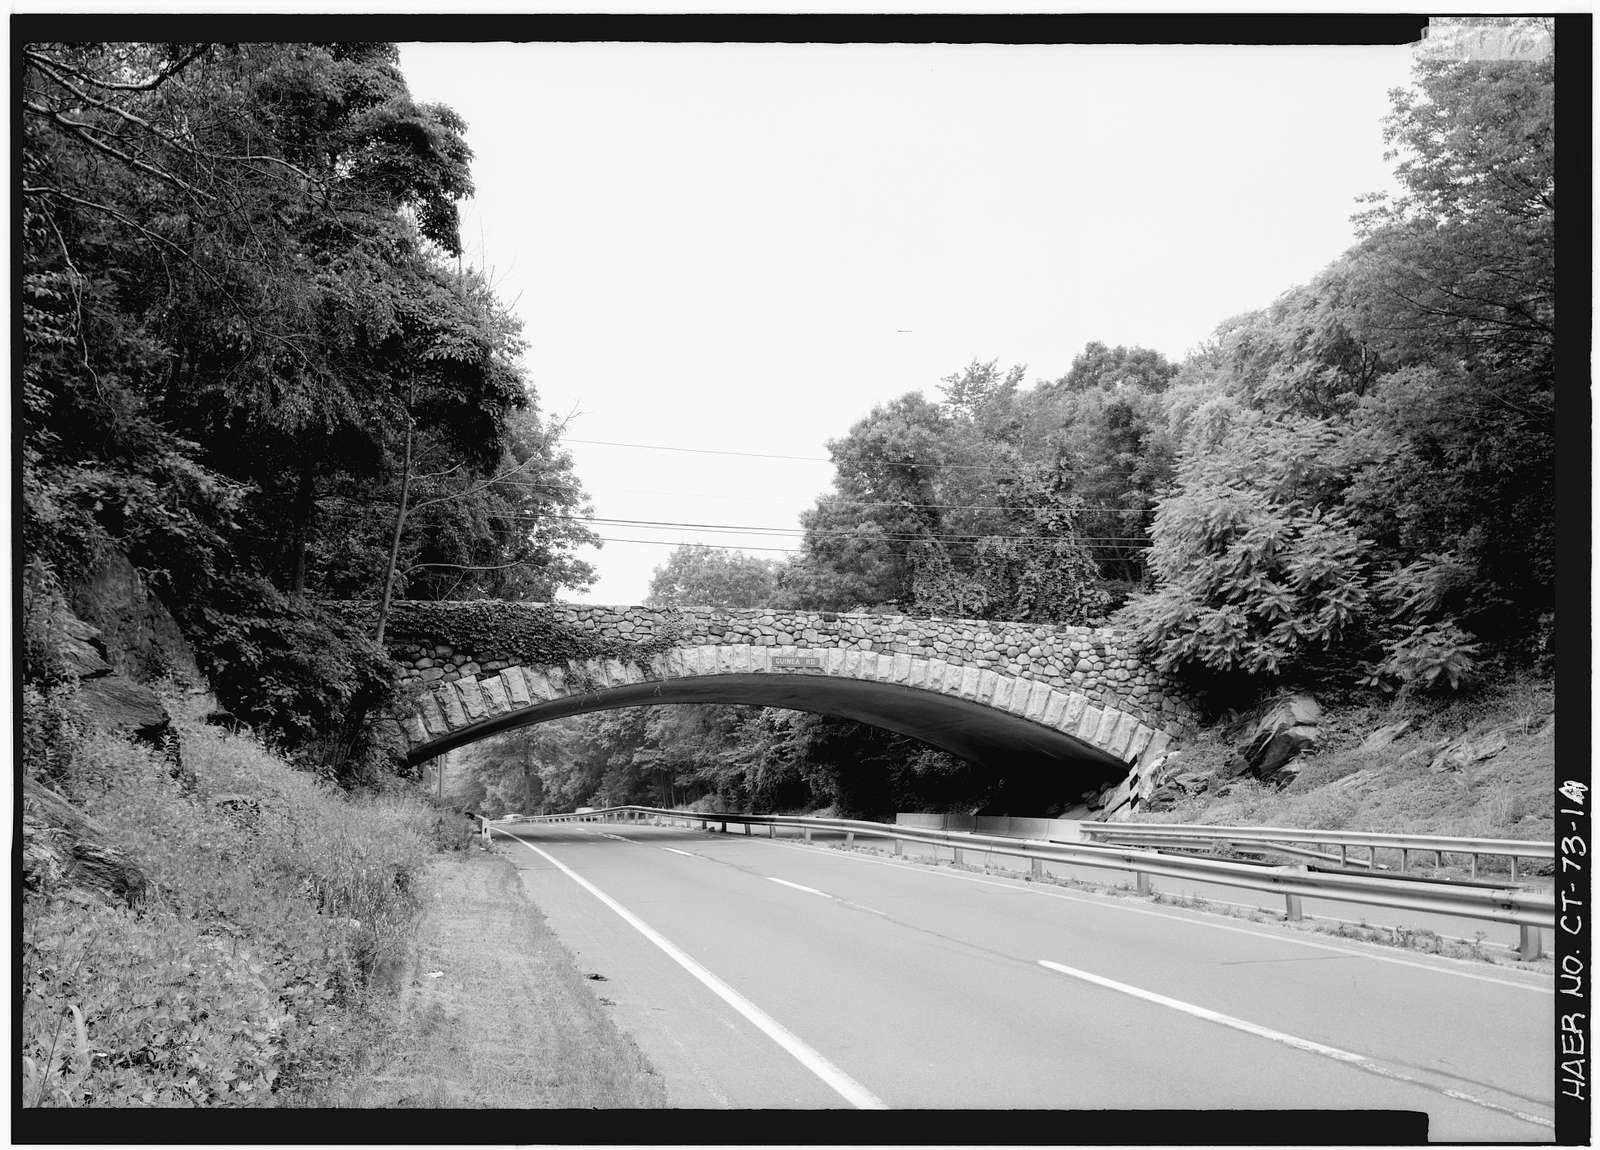 Merritt Parkway, Guinea Road Bridge, Spanning Merritt Parkway, Stamford, Fairfield County, CT